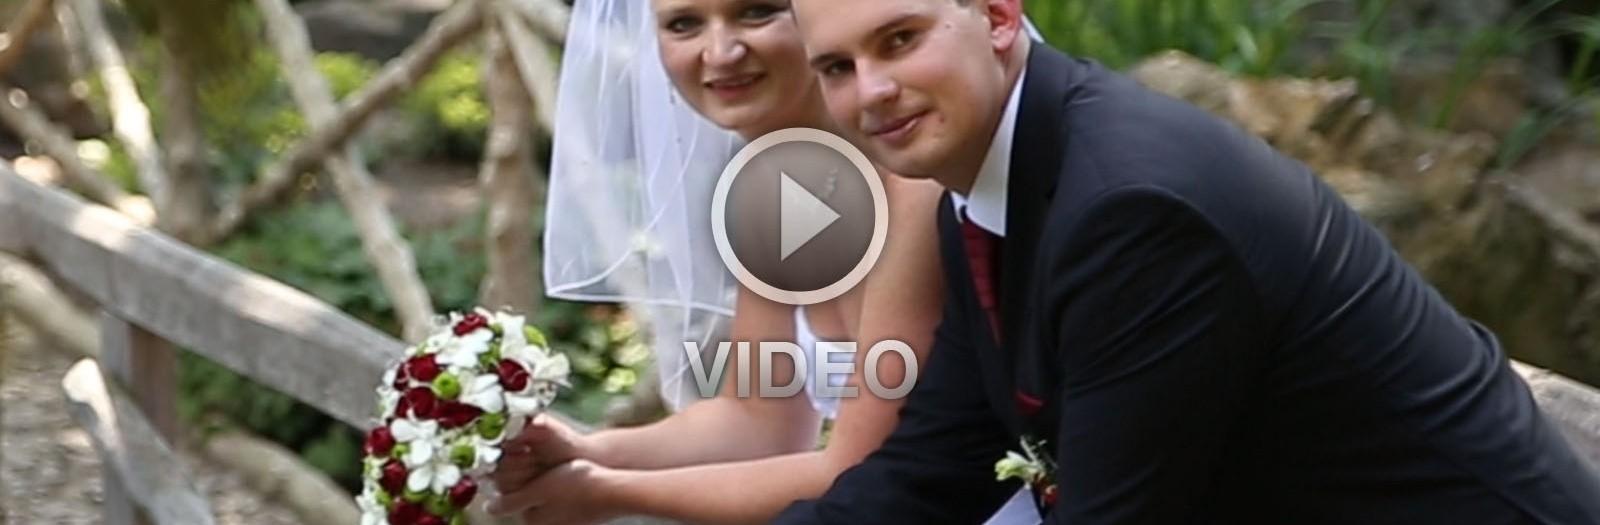 Gabča a Petr - 6.6.2014 - video